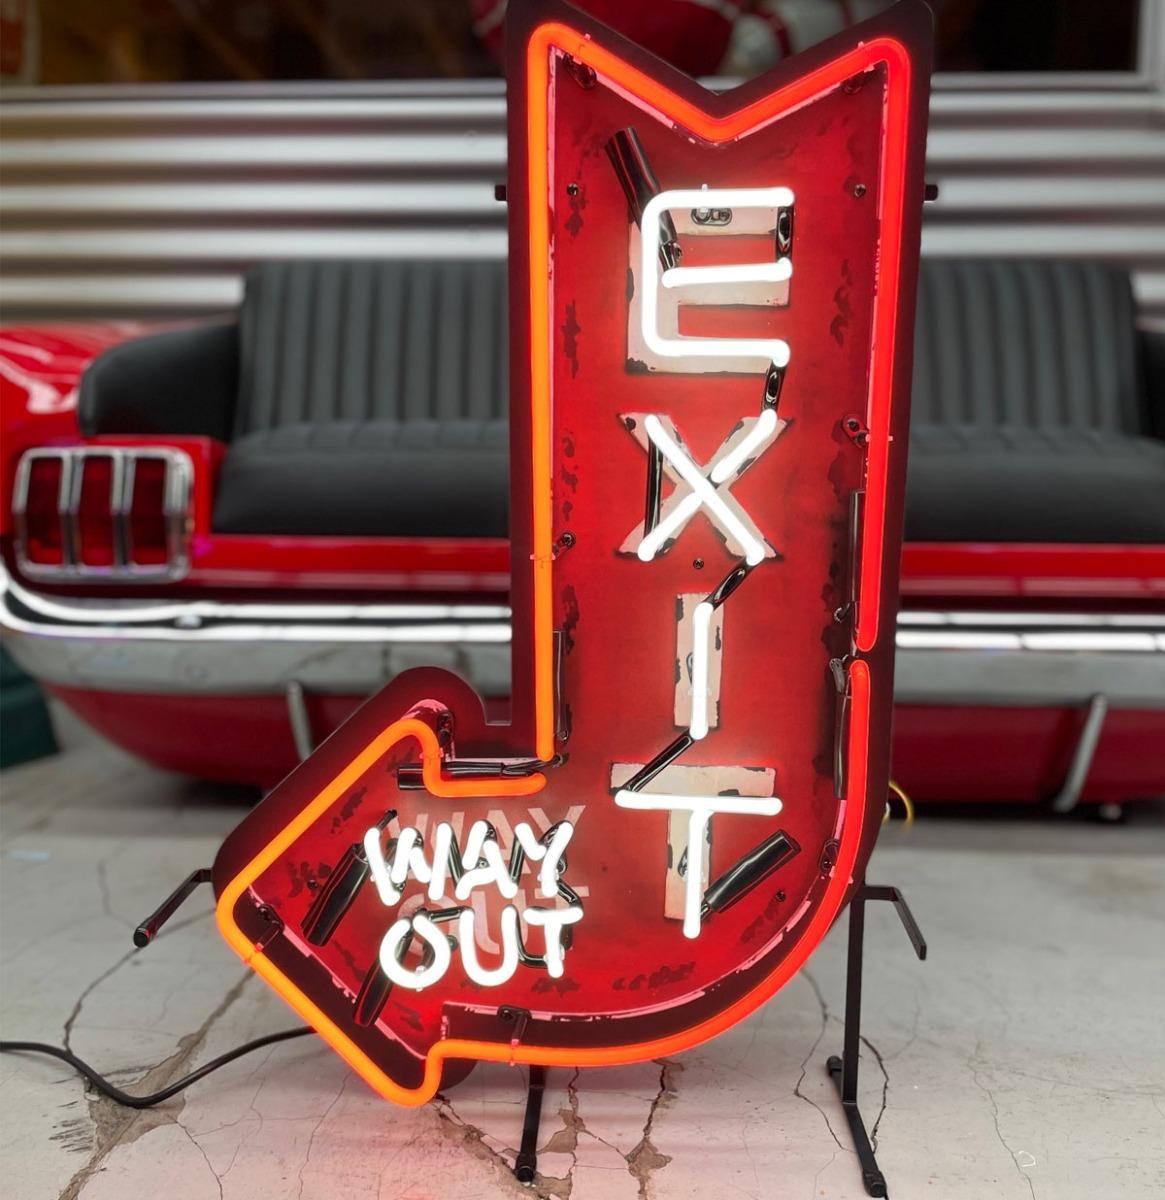 Exit Way Out Arrow Neon Verlichting - 70 x 46 cm